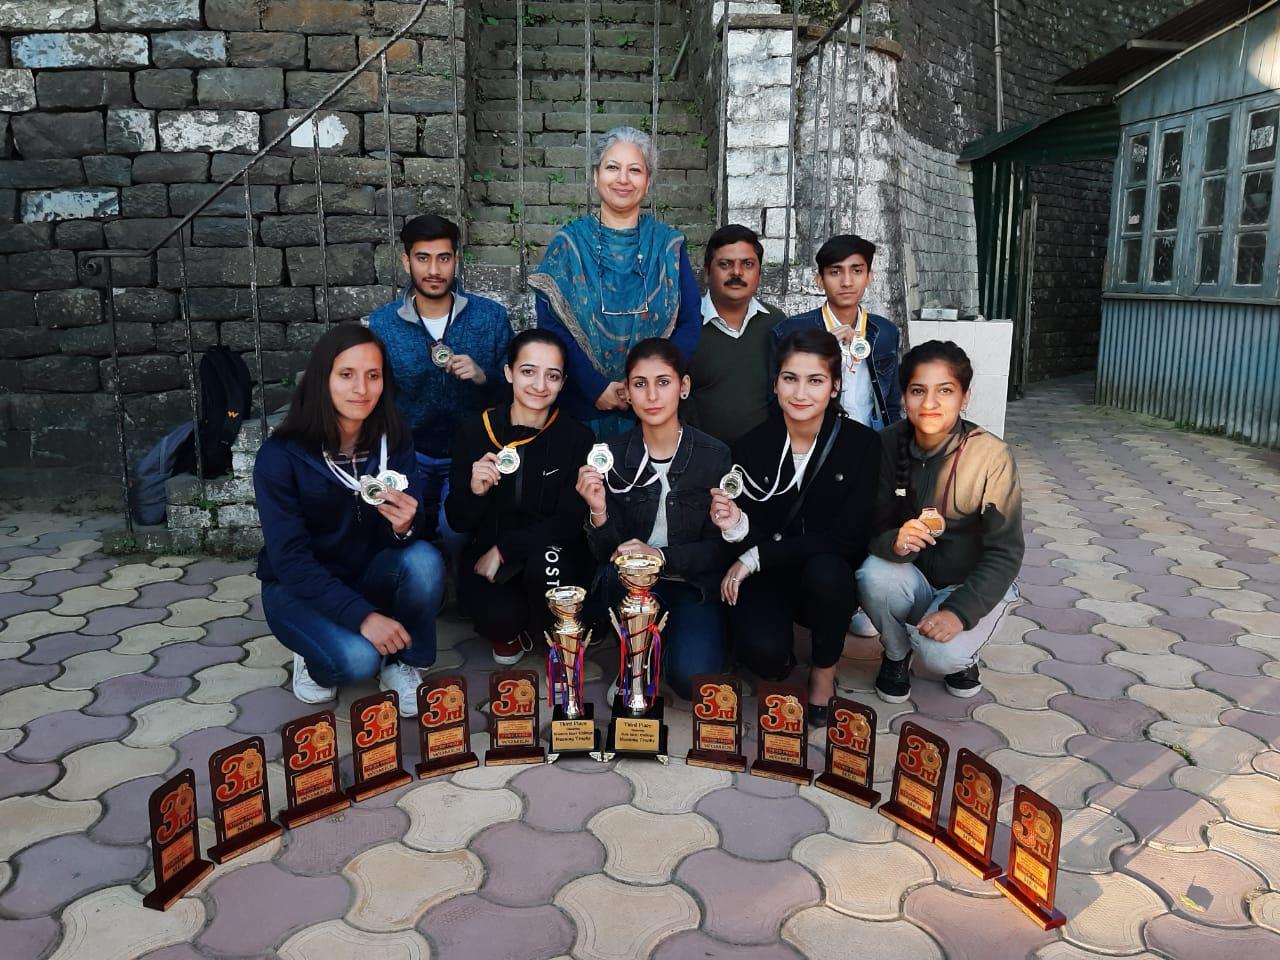 HPUDES Students got prize